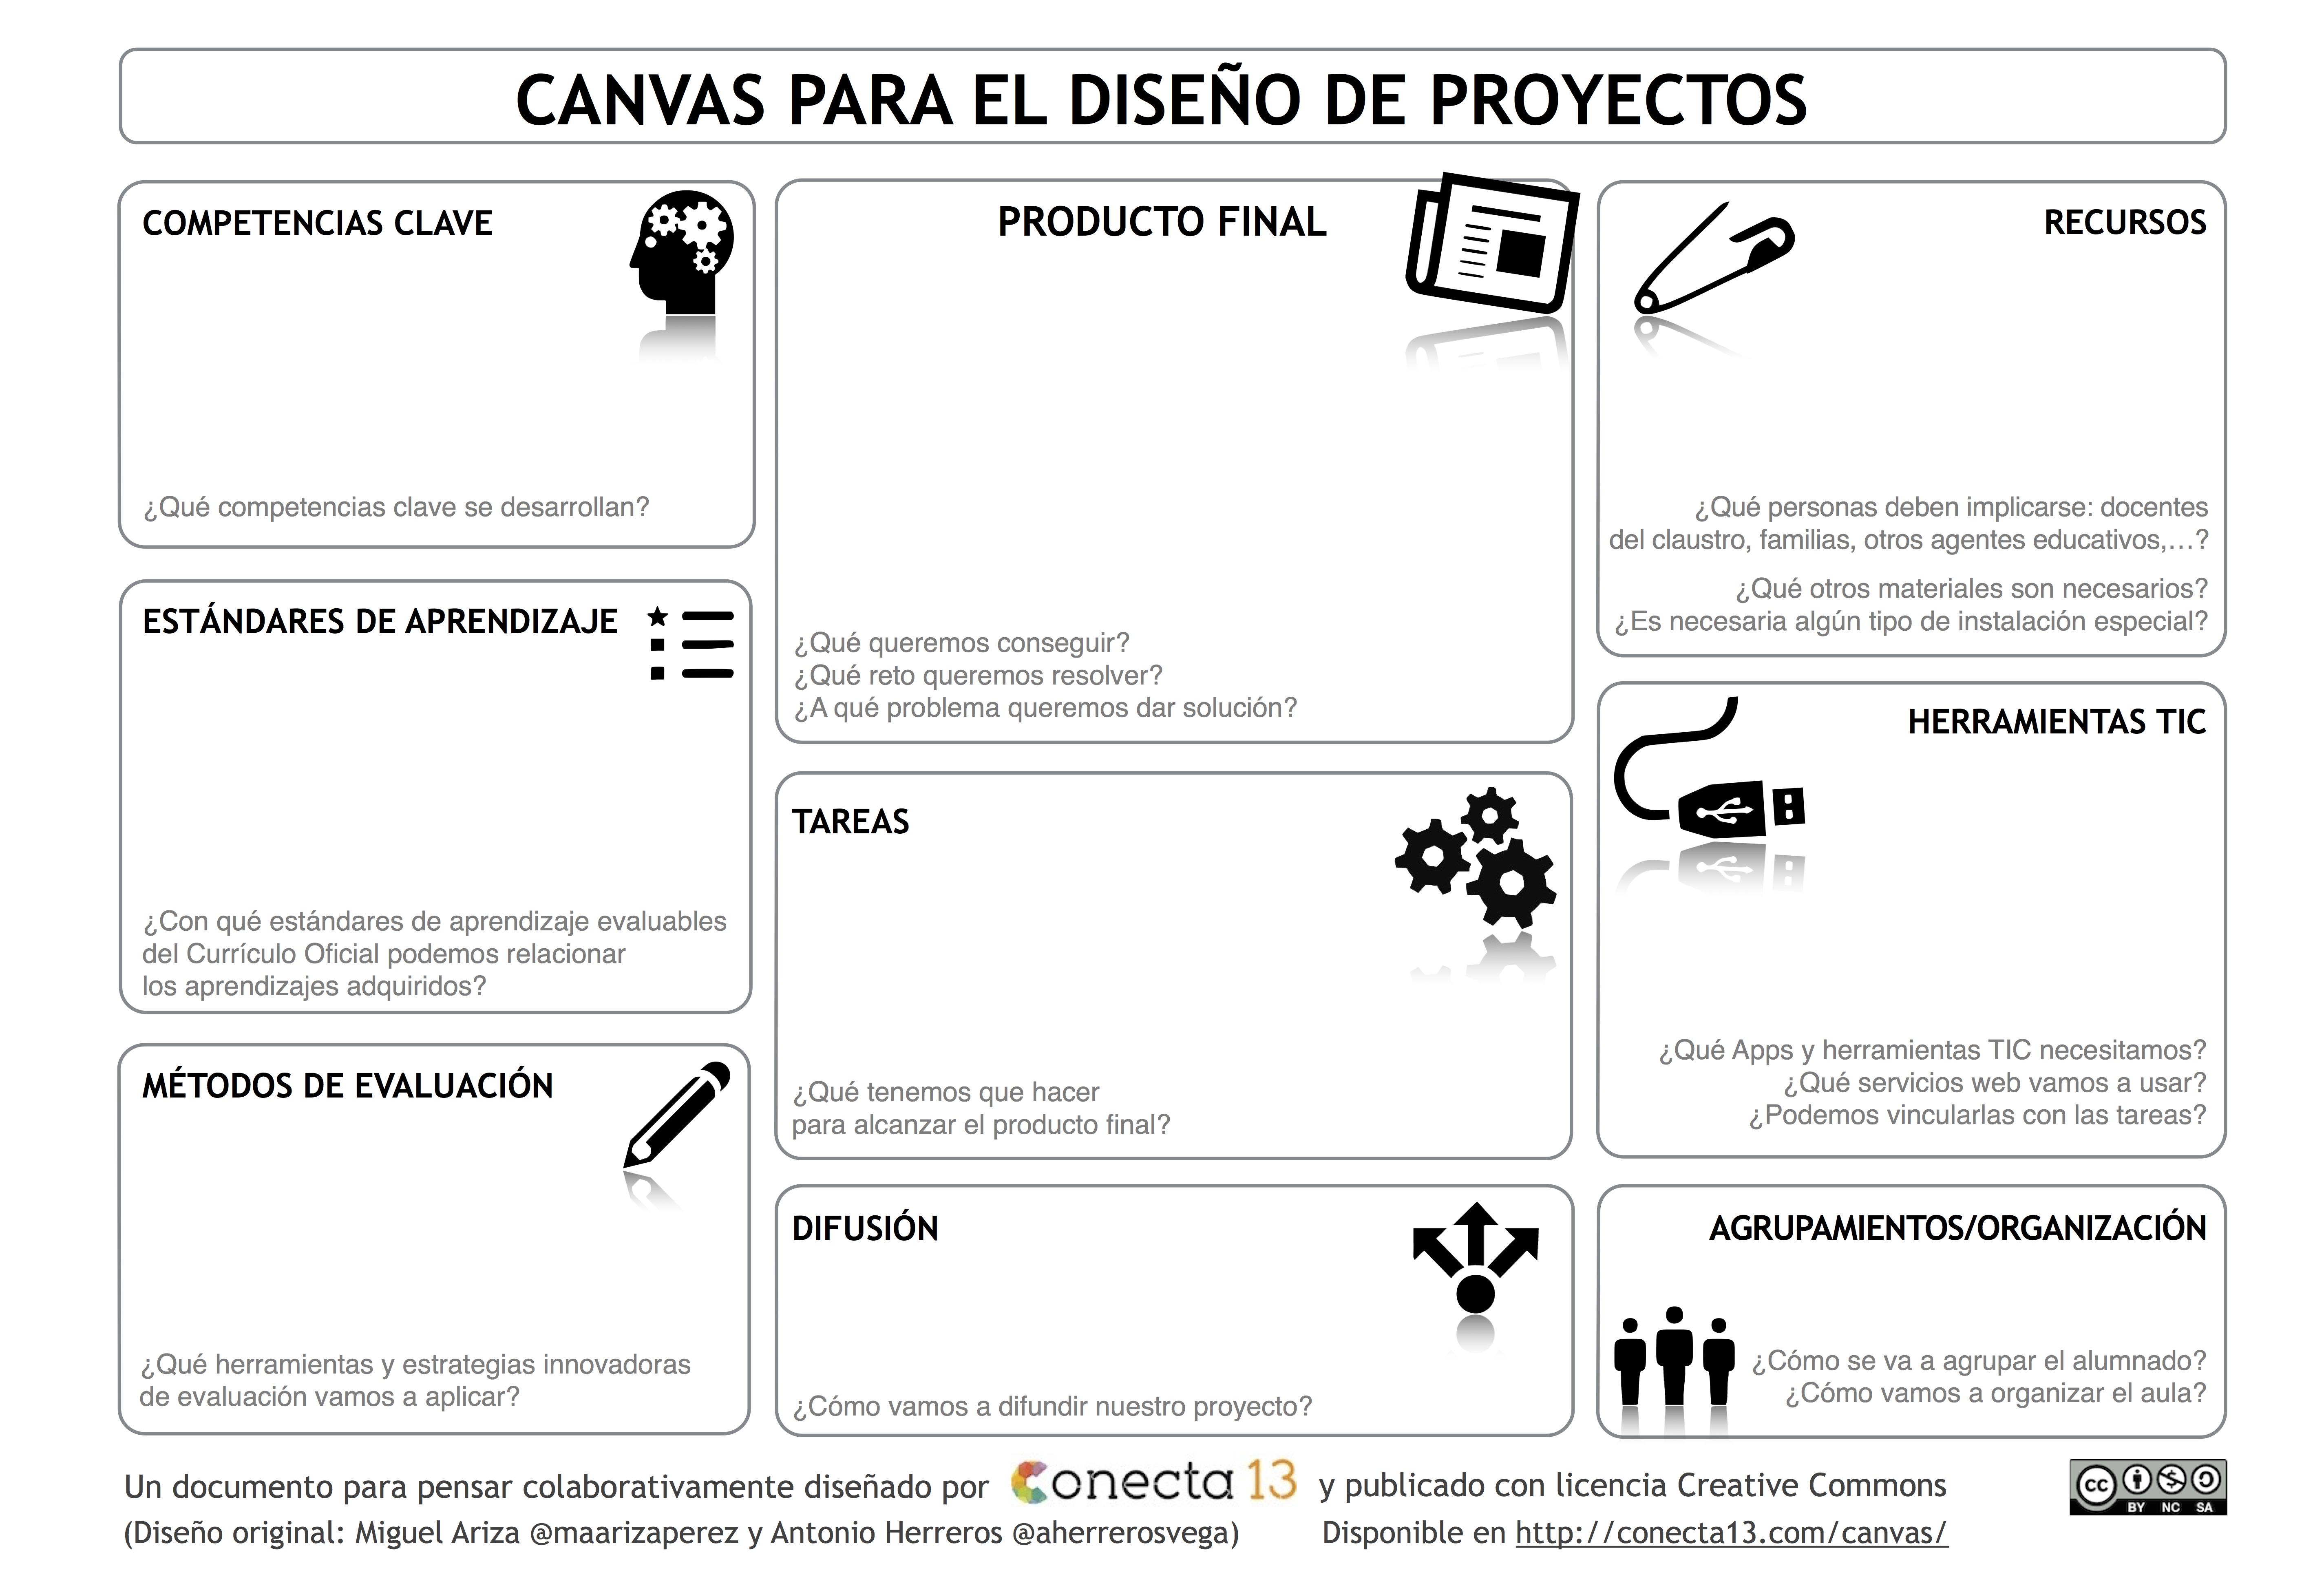 http://conecta13.com/wp-content/uploads/2015/06/CANVAS_Proyectos_C13_alta_resolucion.png